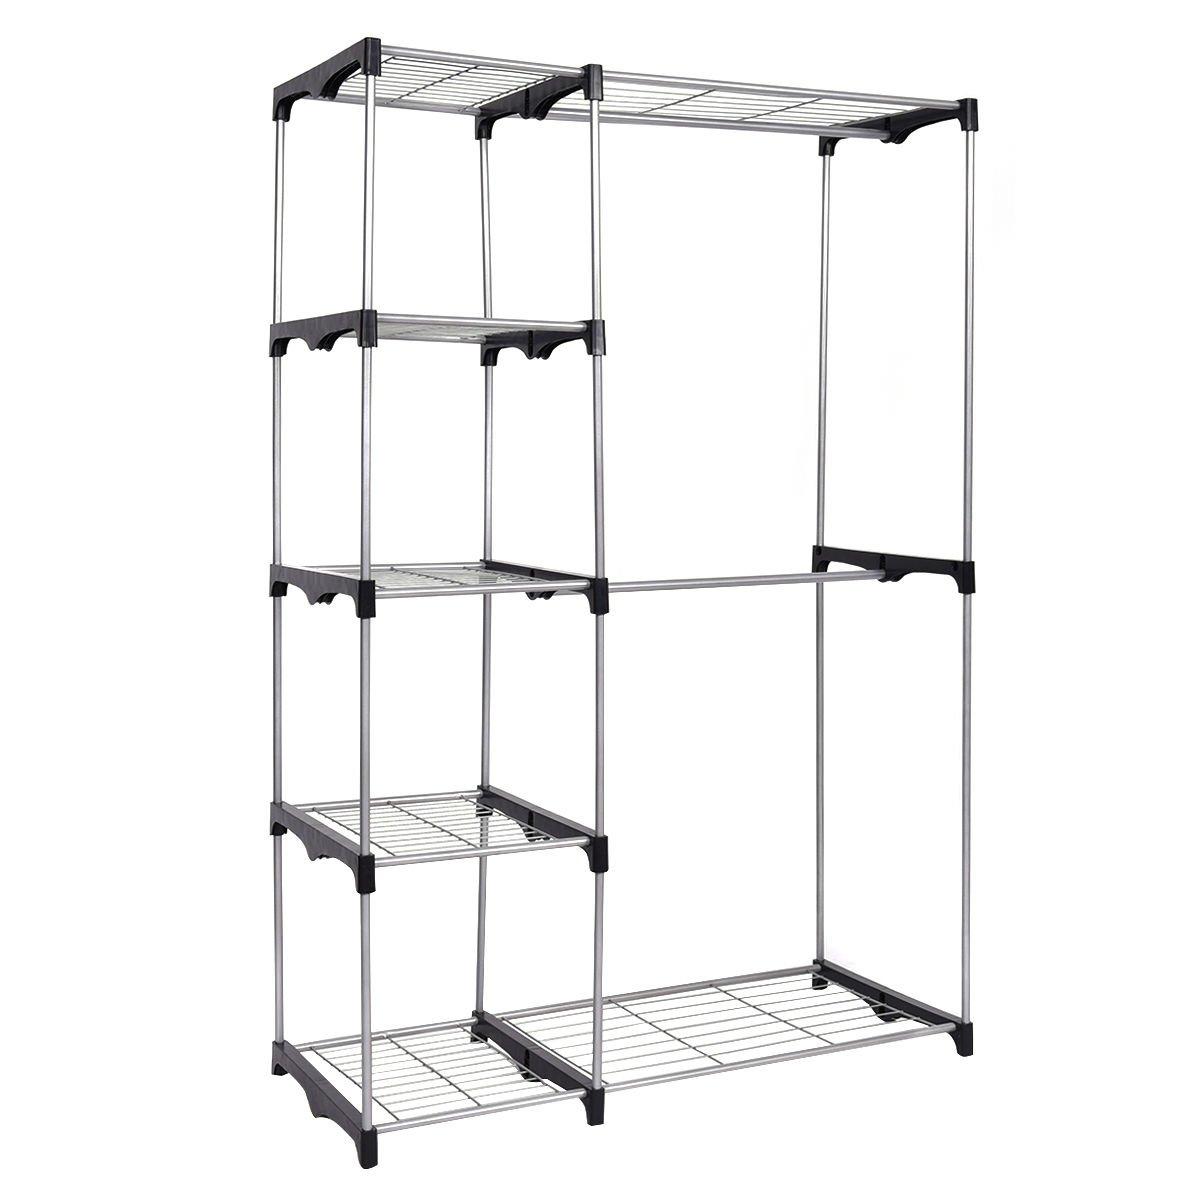 Closet Organizer Storage Rack Portable Wardrobe Garment Hanger Double Rod Shelf by Unknown